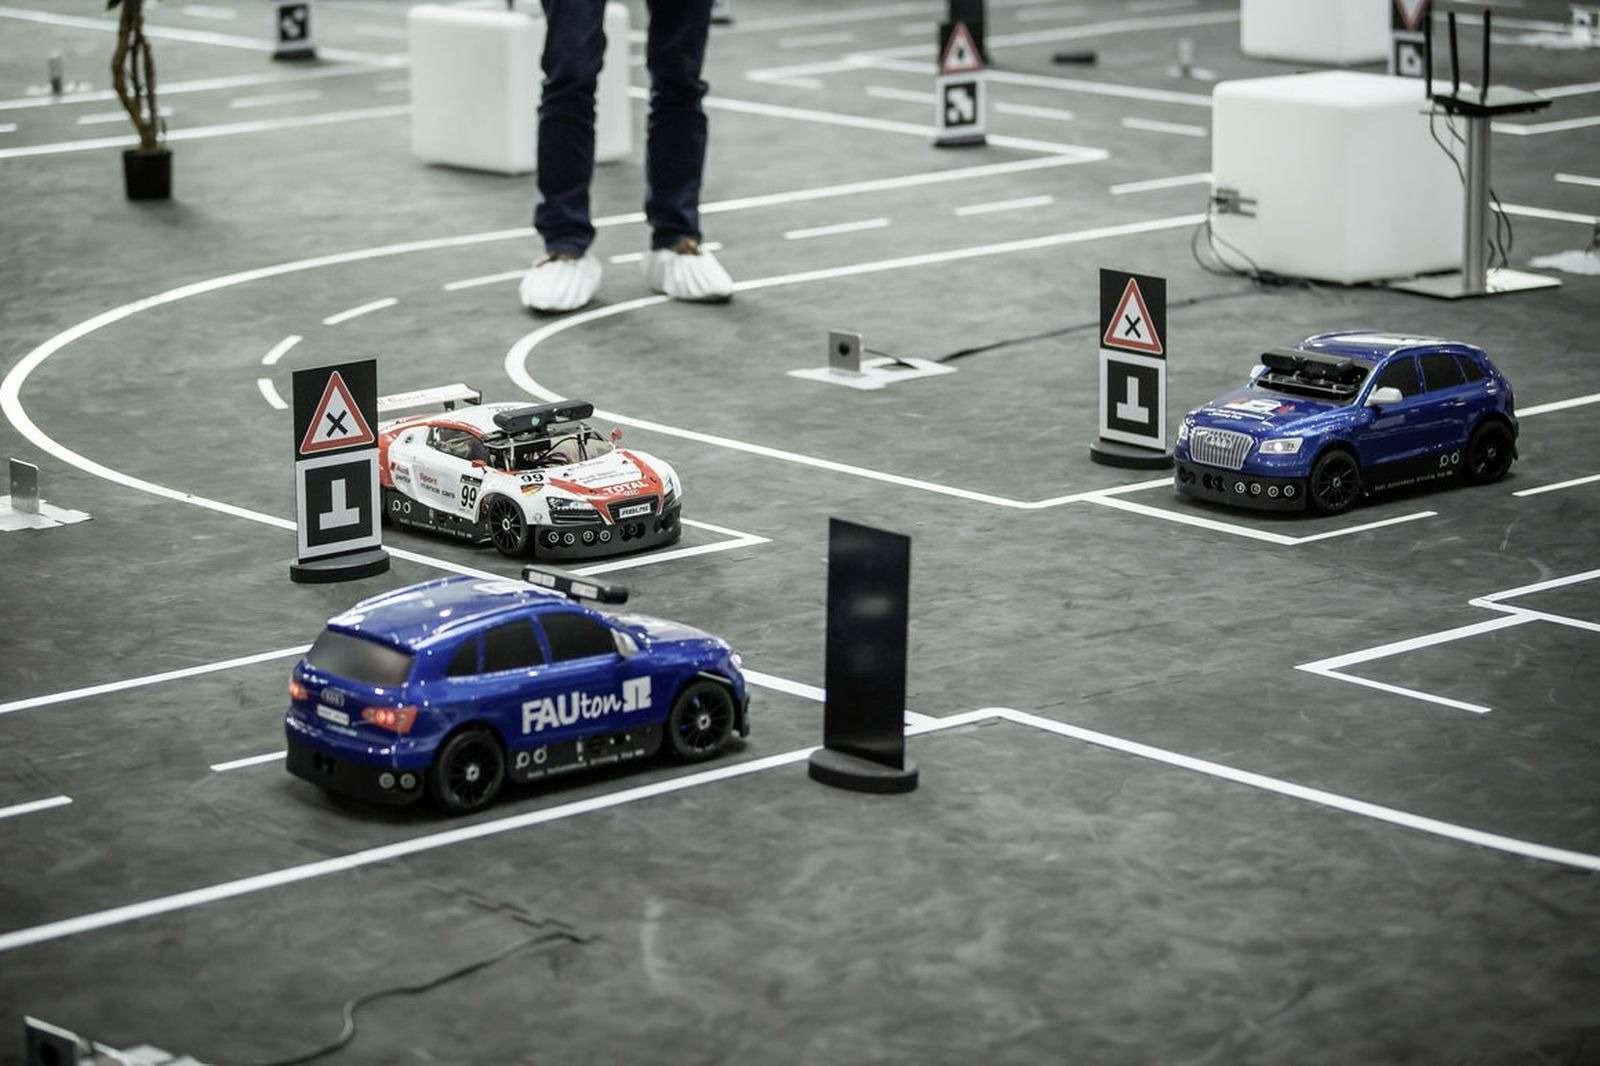 Роботы вместо футболистов, или Как водителей оставят без руля— фото 574749